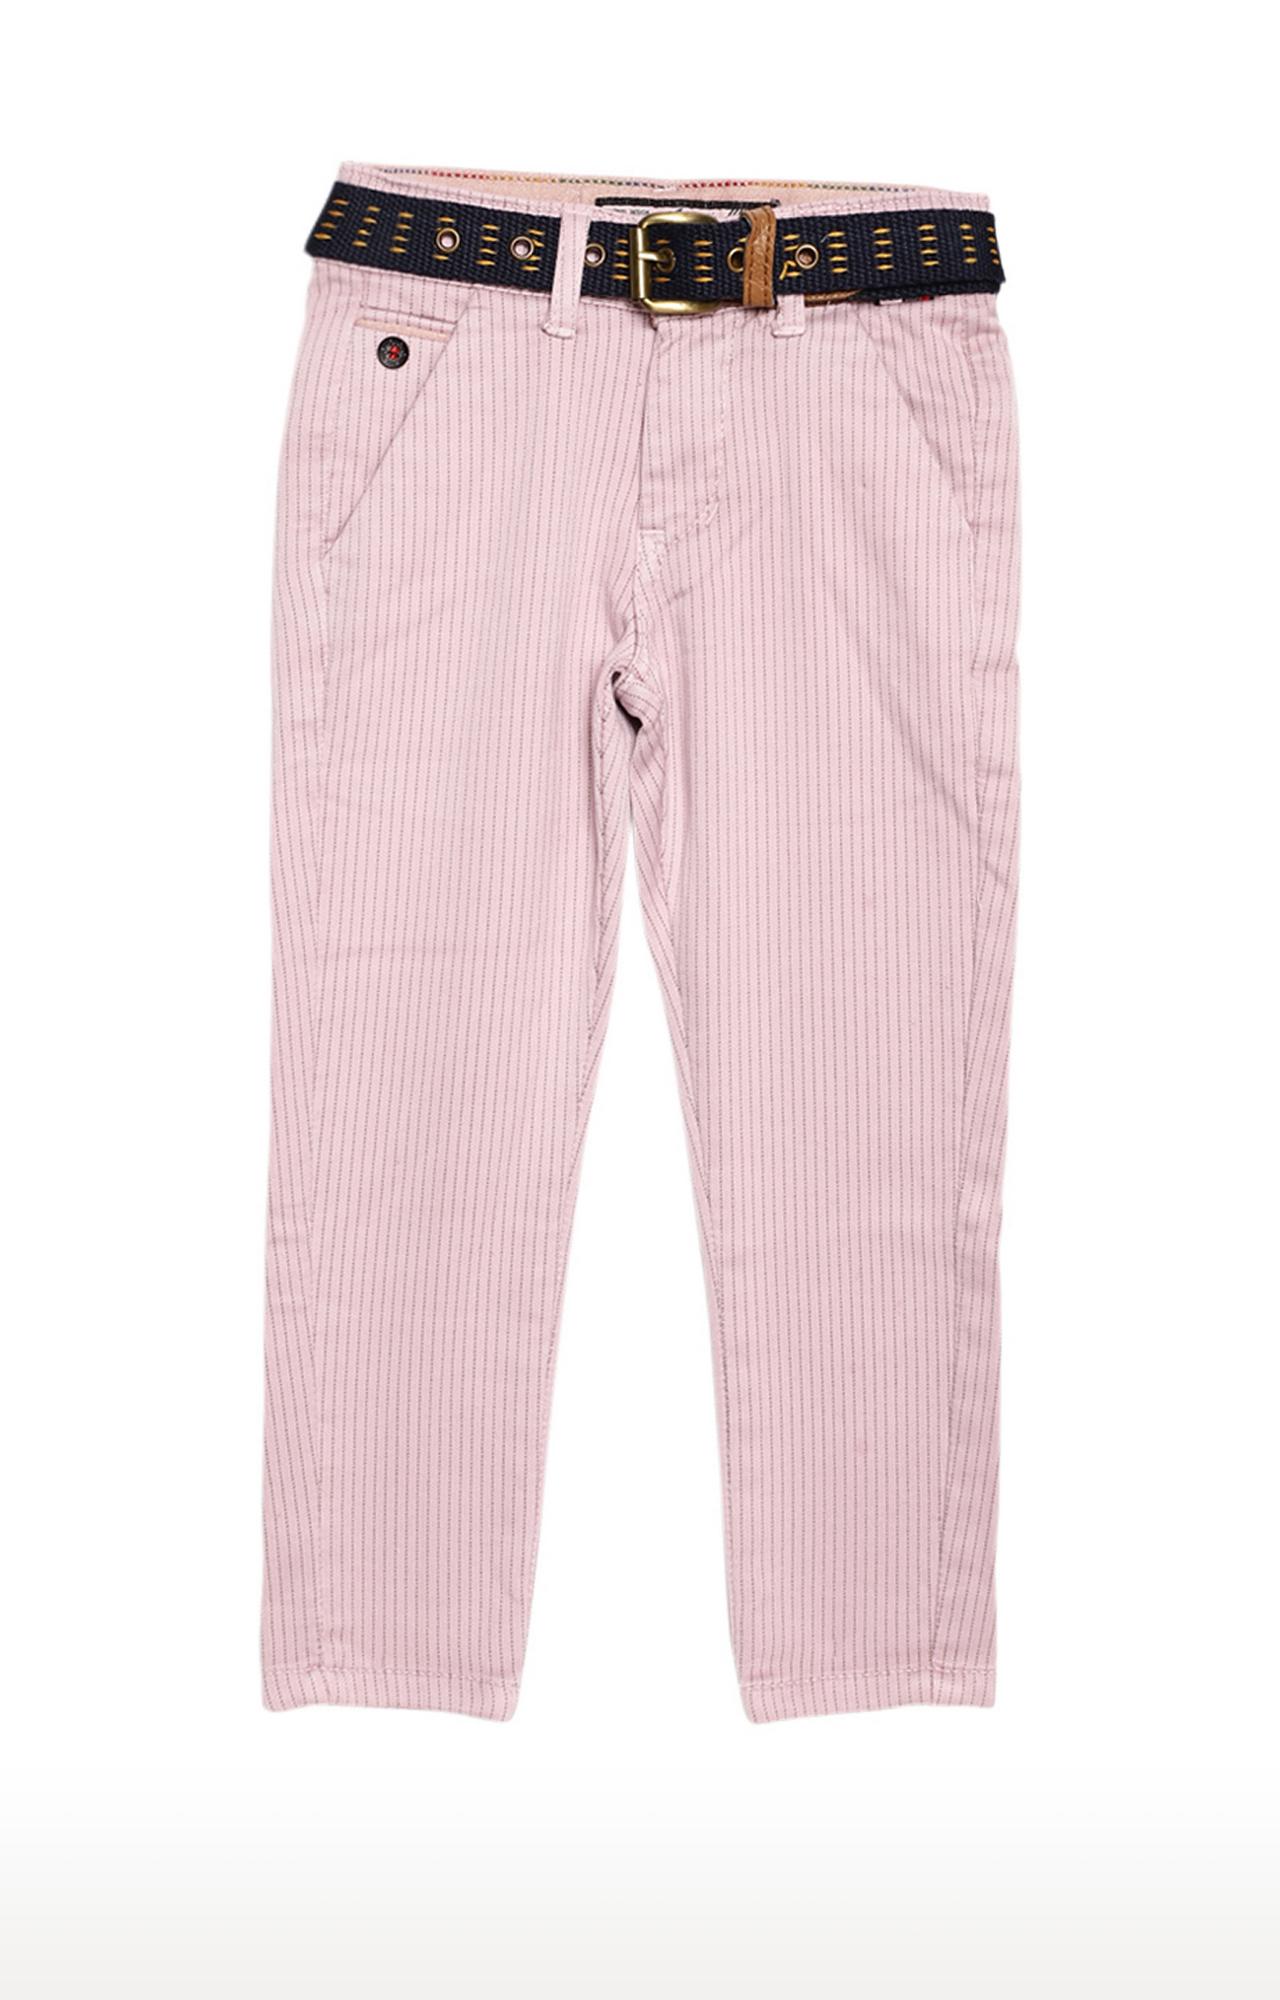 Tadpole | Pink Striped Regular-Fit Jeans